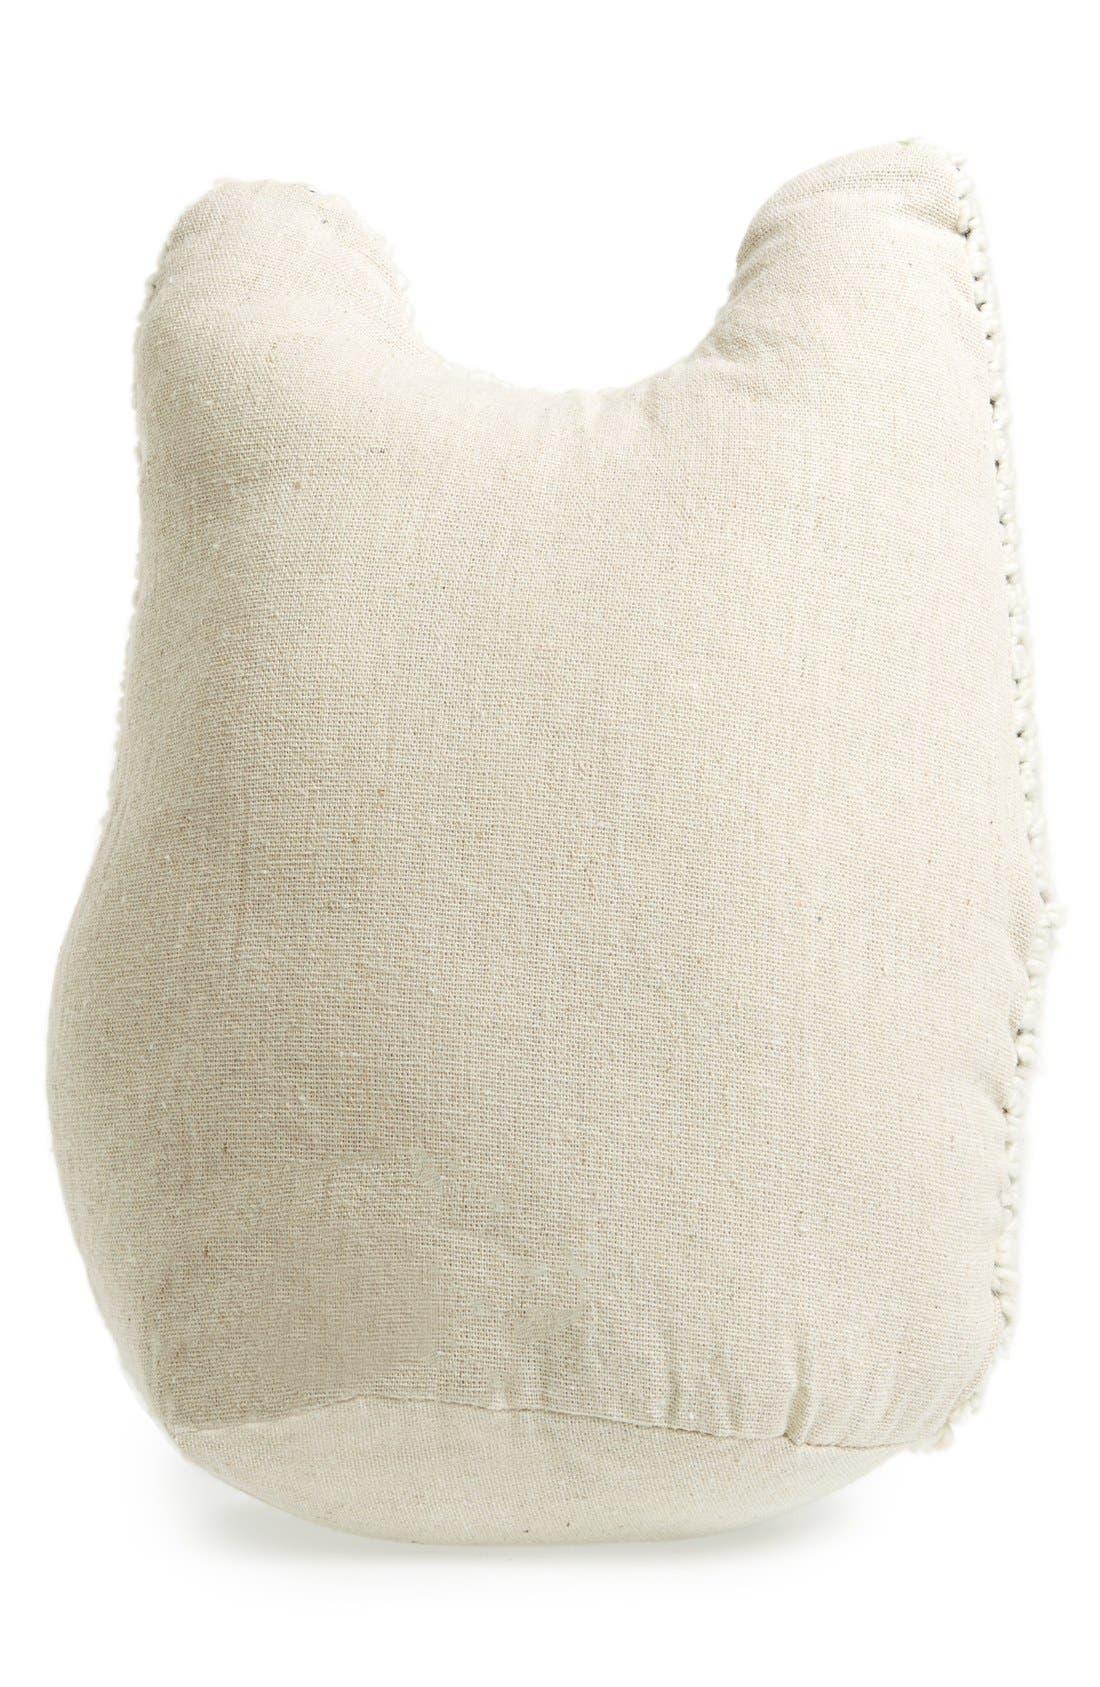 Alternate Image 2  - LevtexKnit OwlAccent Pillow